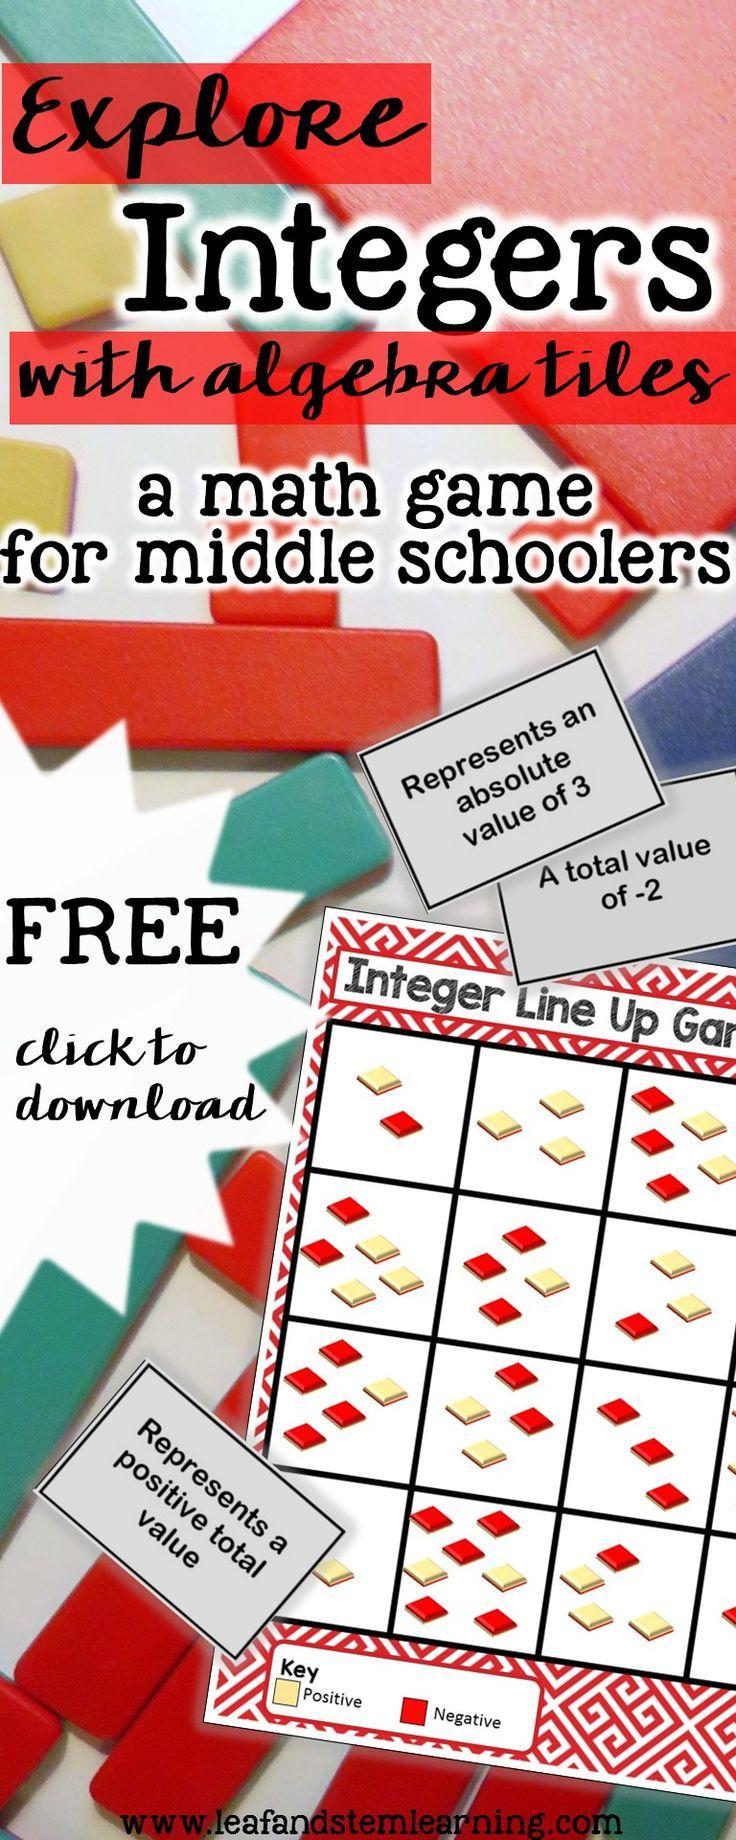 Free Integer Center | Algebra Tiles Game | Middle School Math